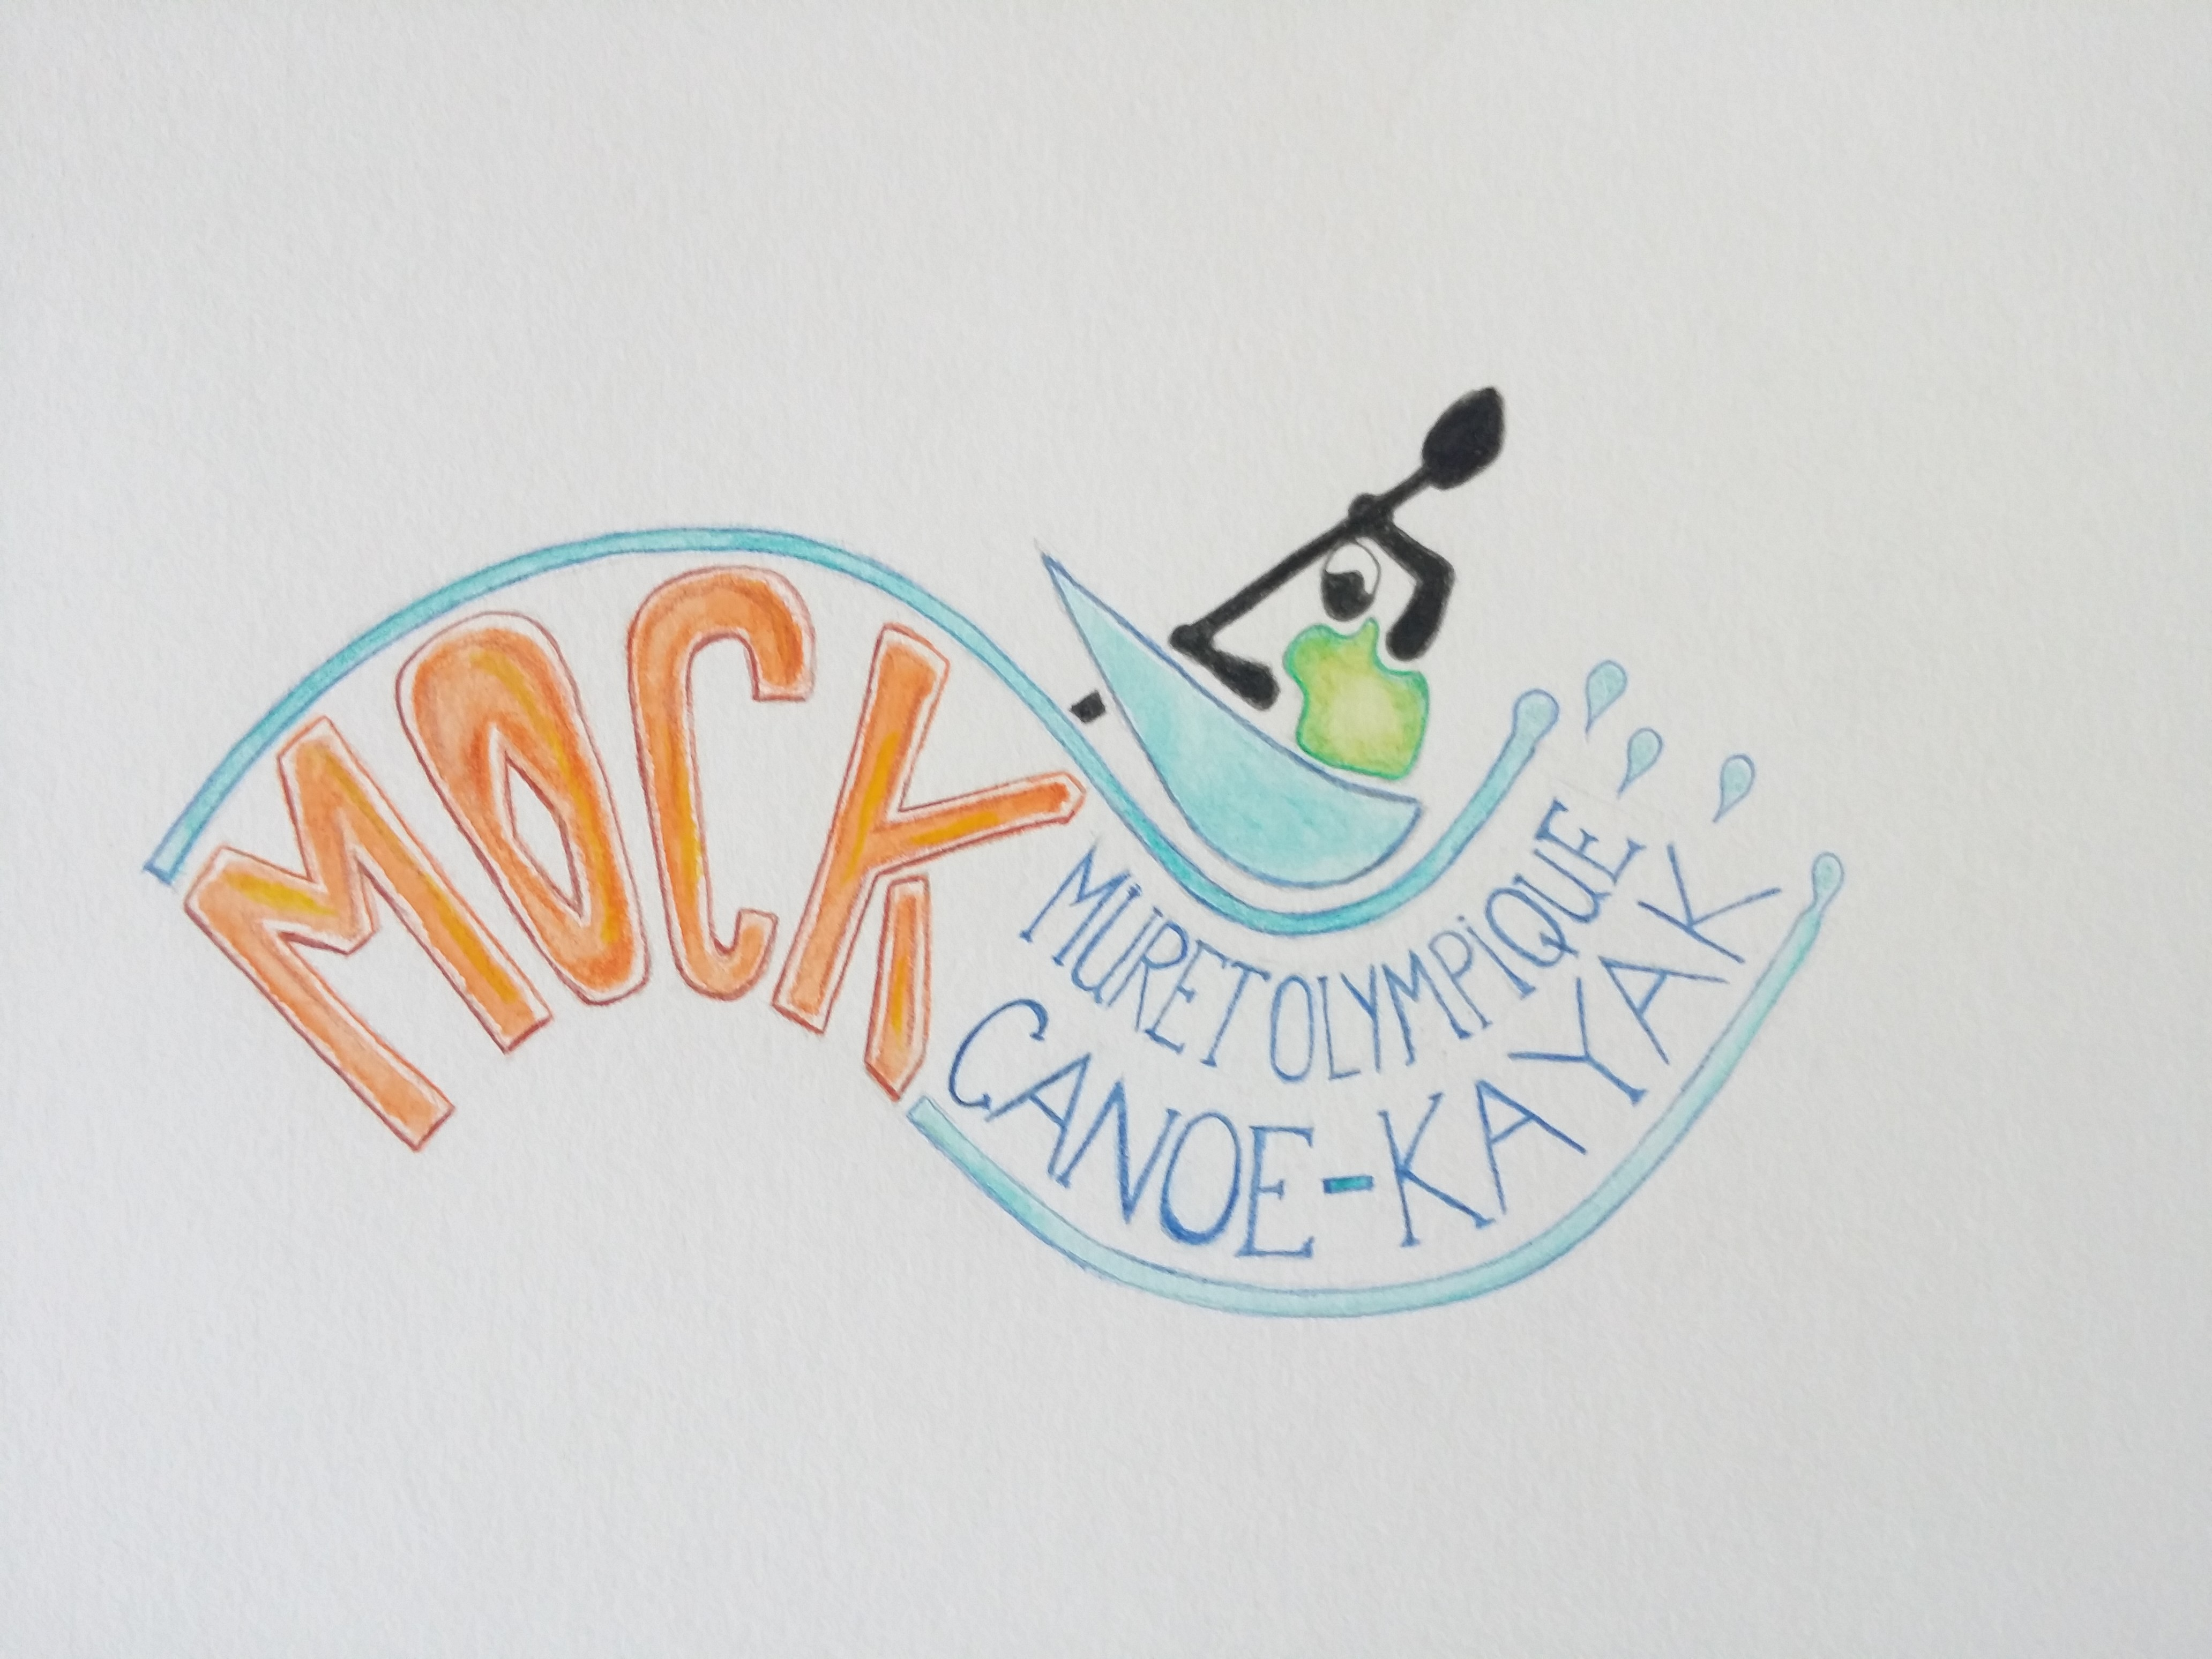 Muret olympique canoë-kayak